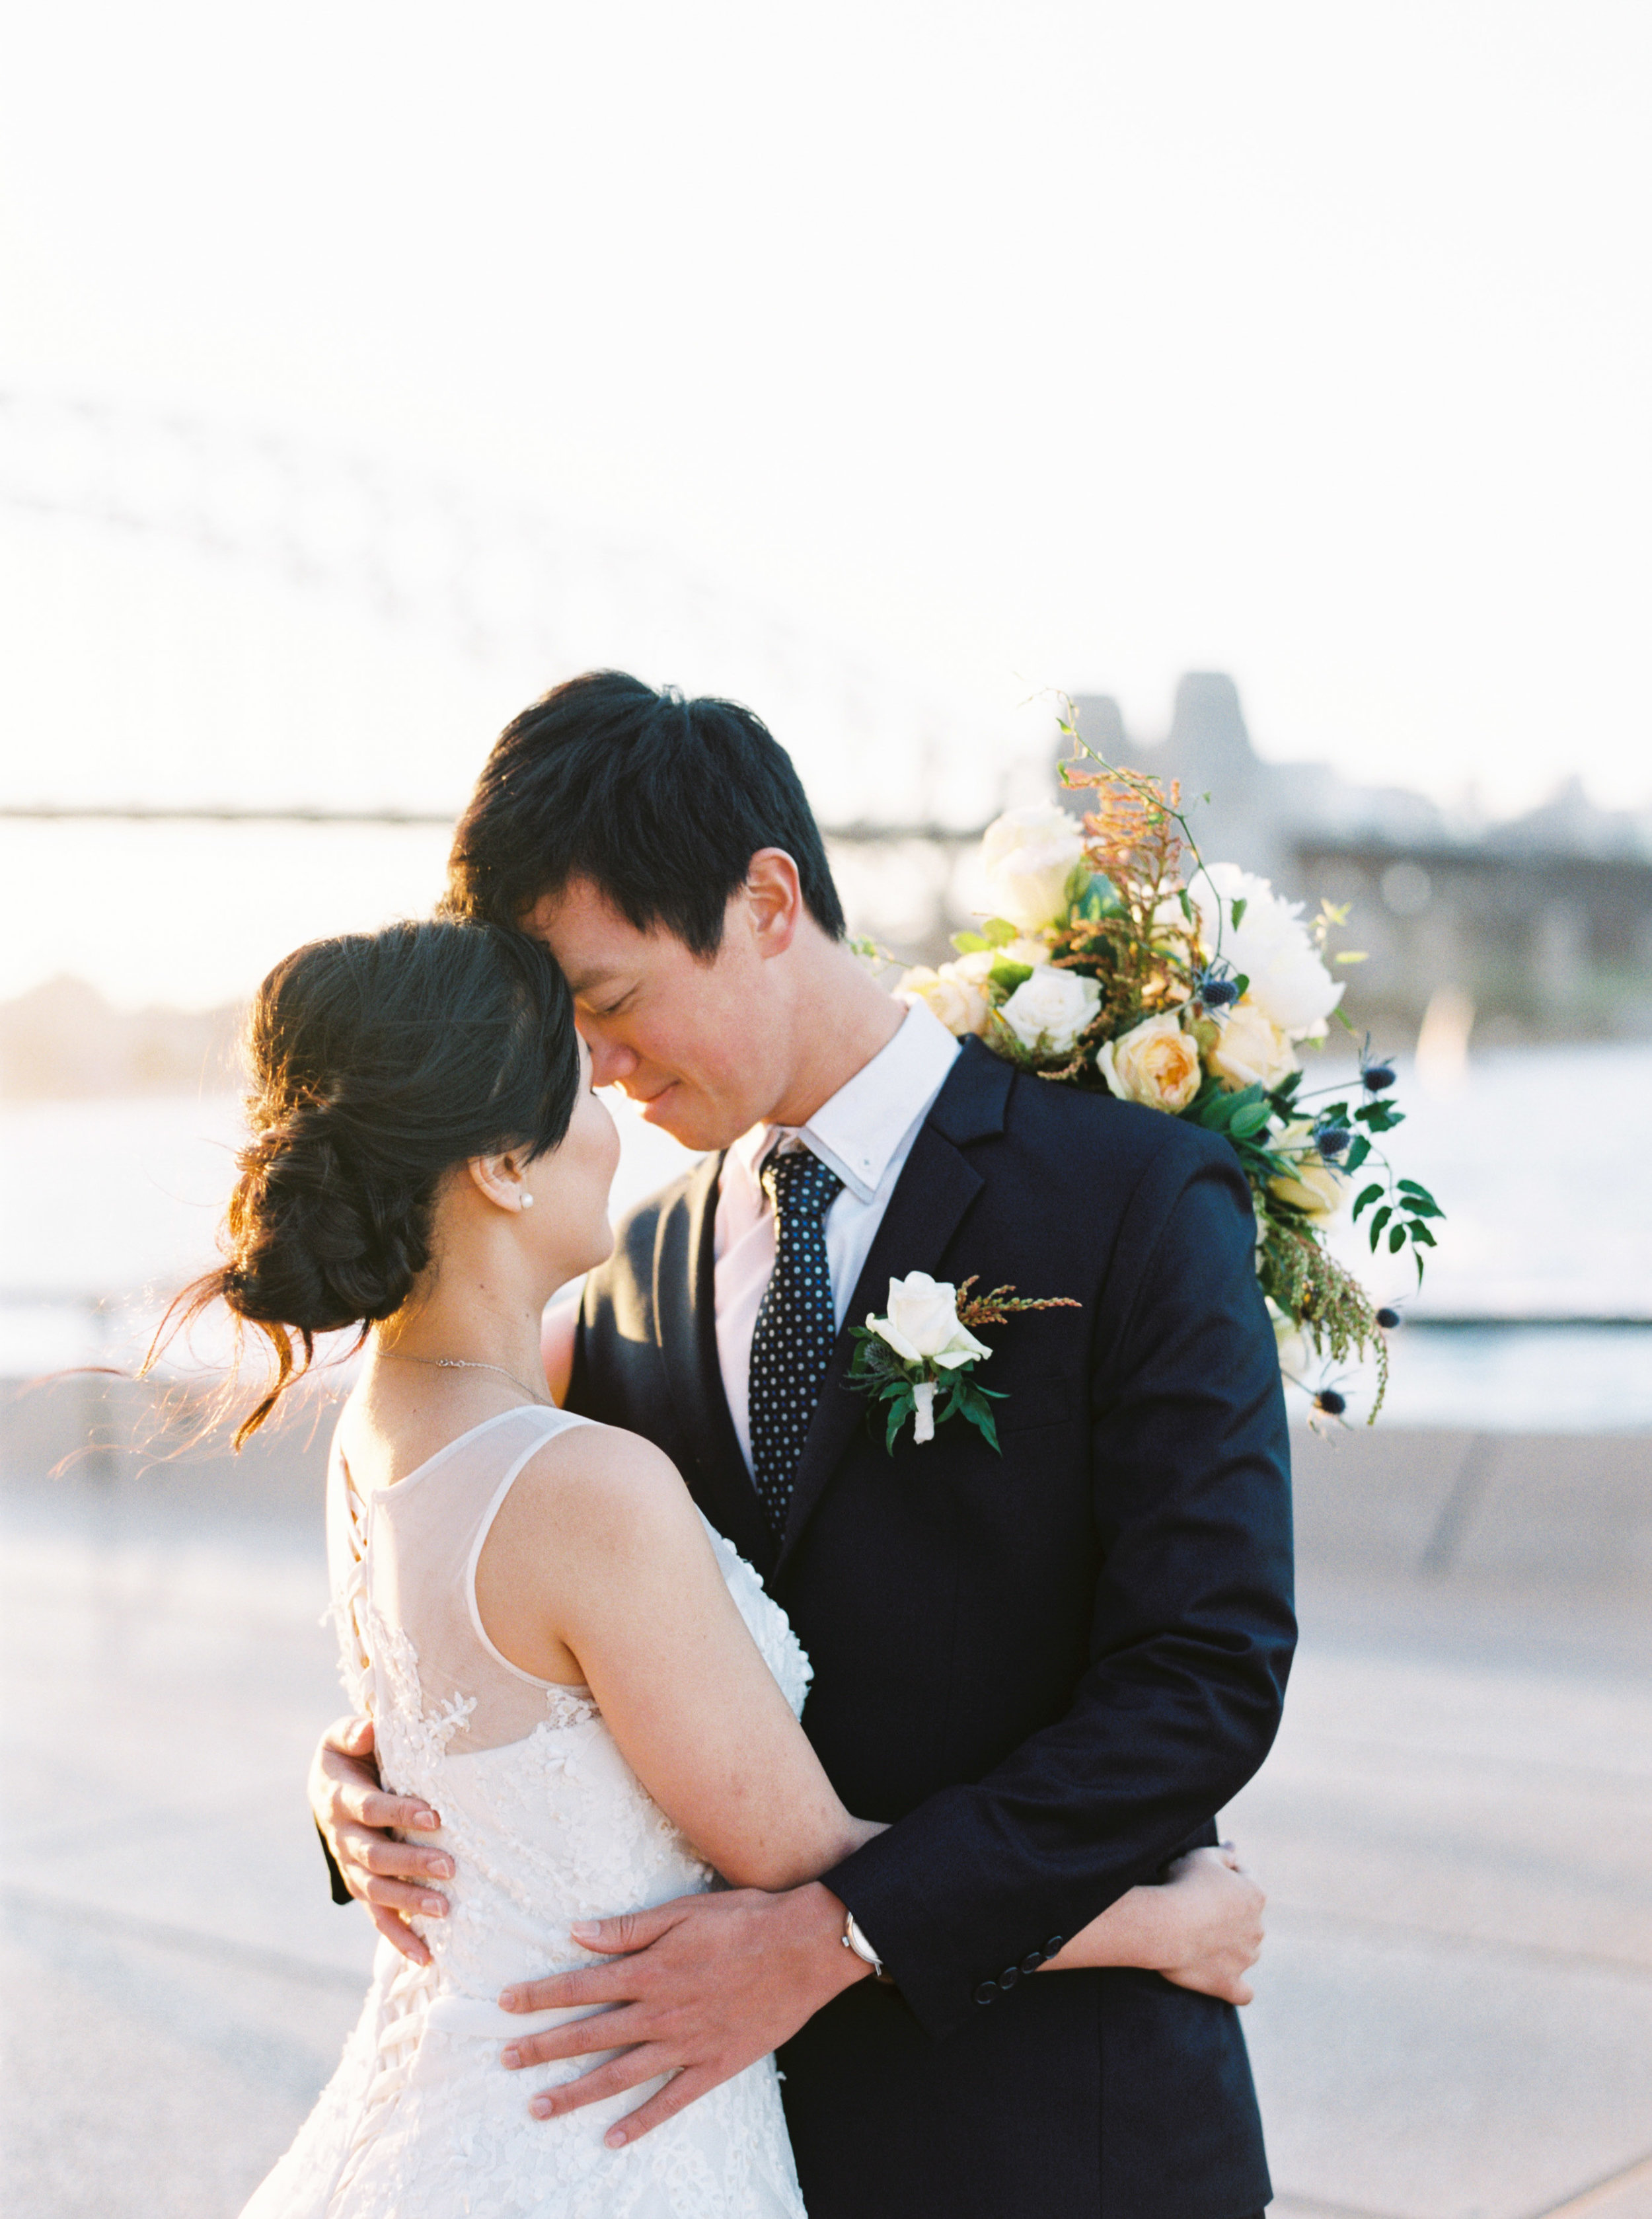 00037- Australia Sydney Wedding Photographer Sheri McMahon.jpg